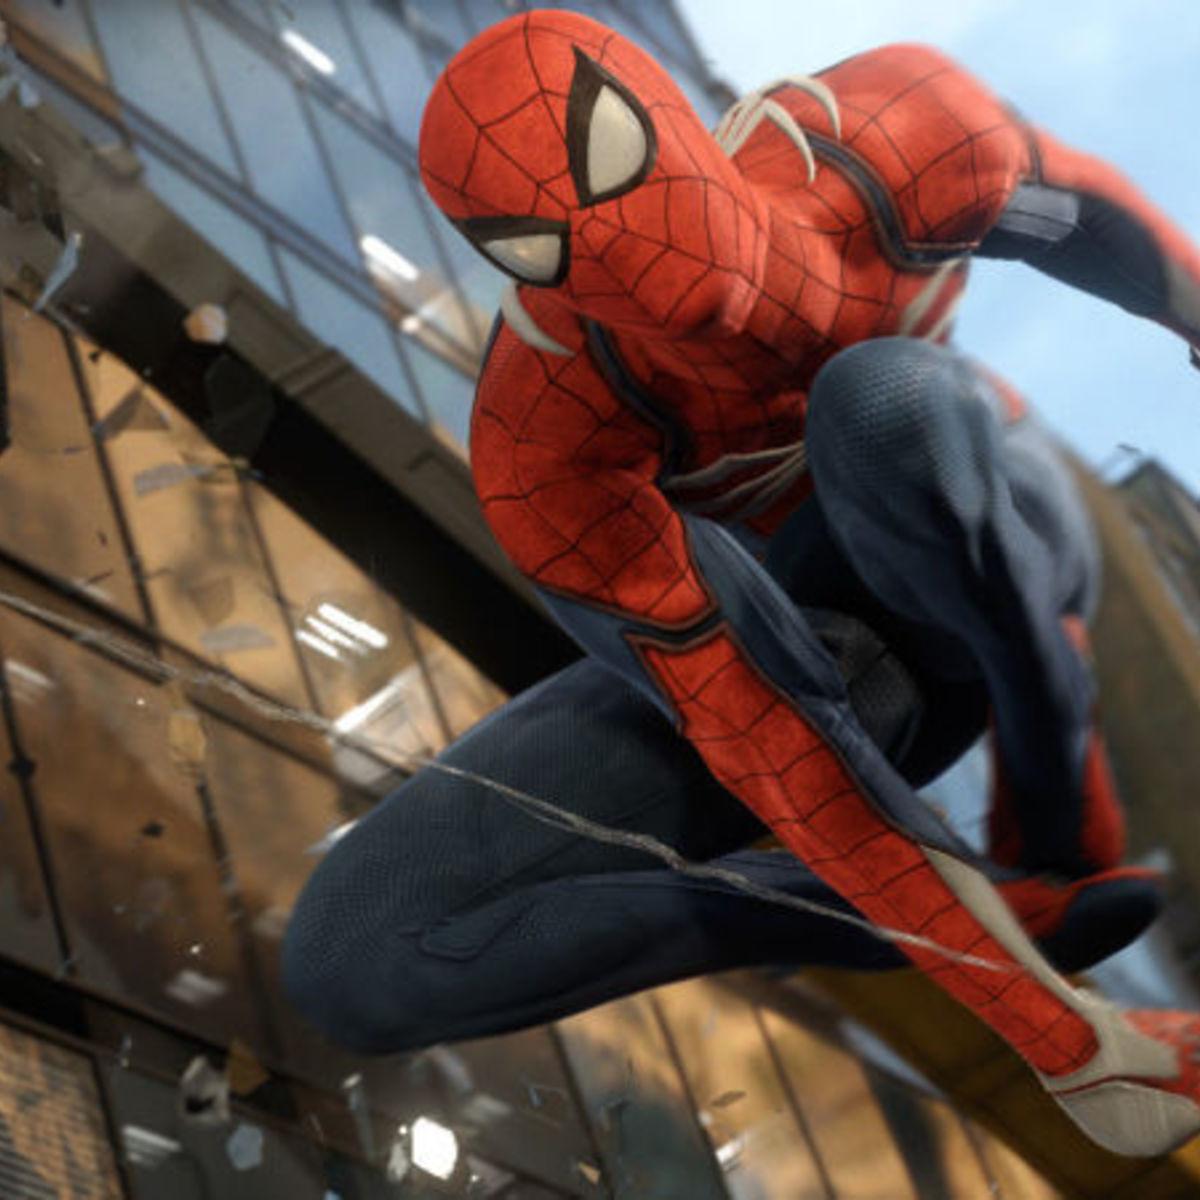 Spider-Man - PlayStation 4 shot